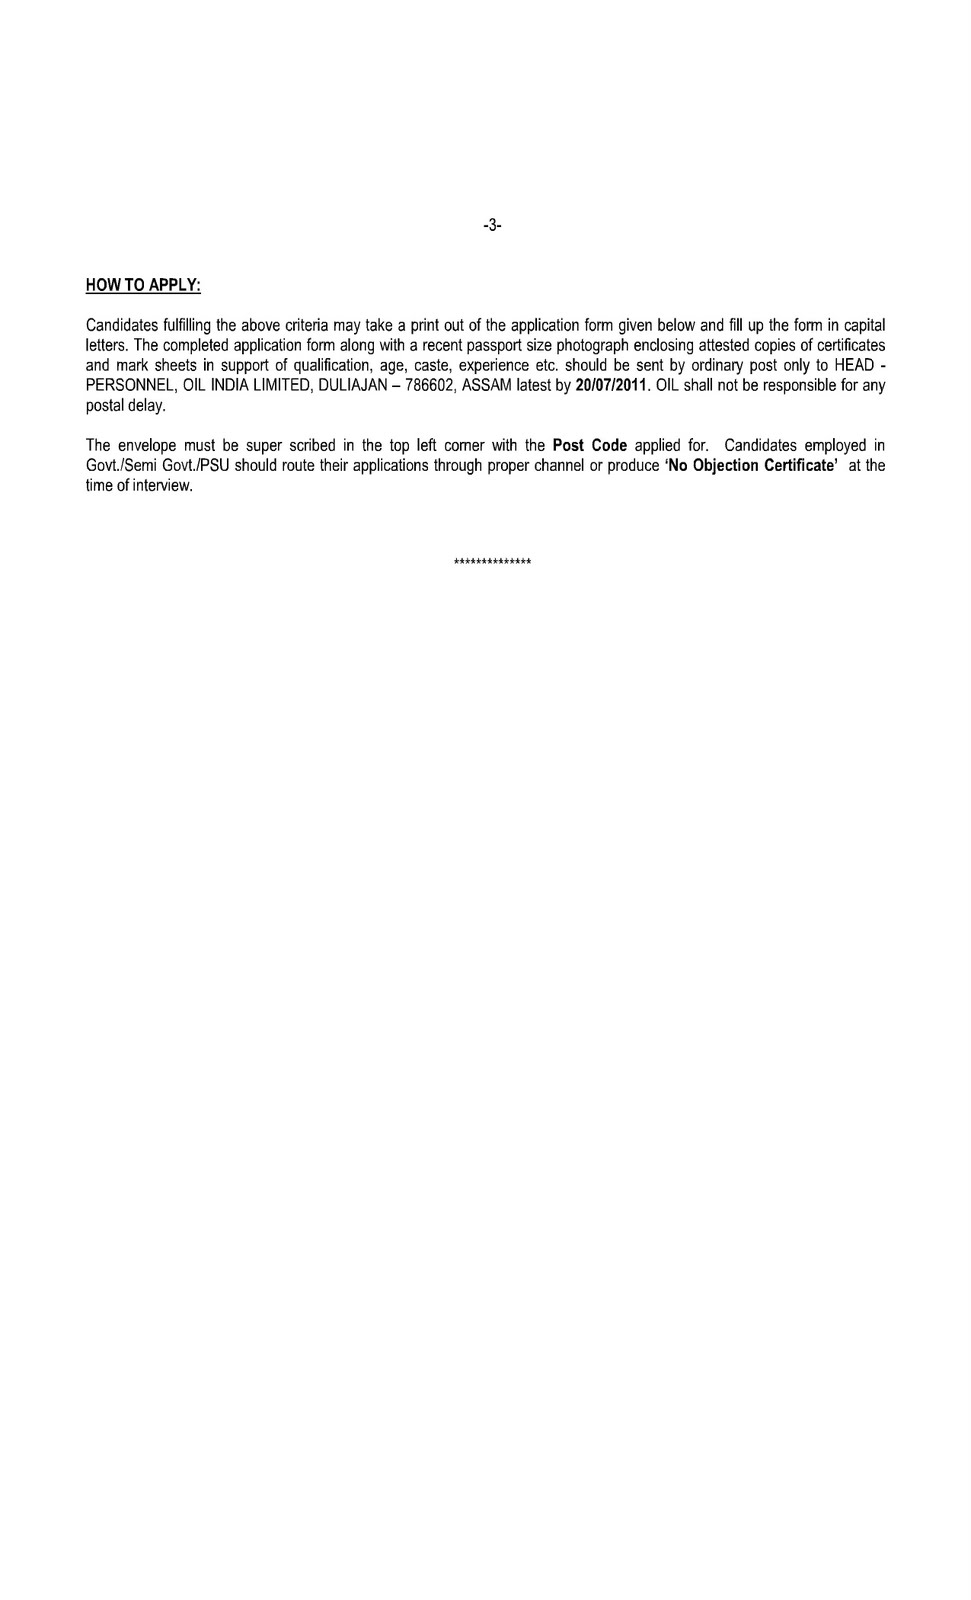 Cghs Reimbursement Forms Notification Of Reimbursement Of Medical